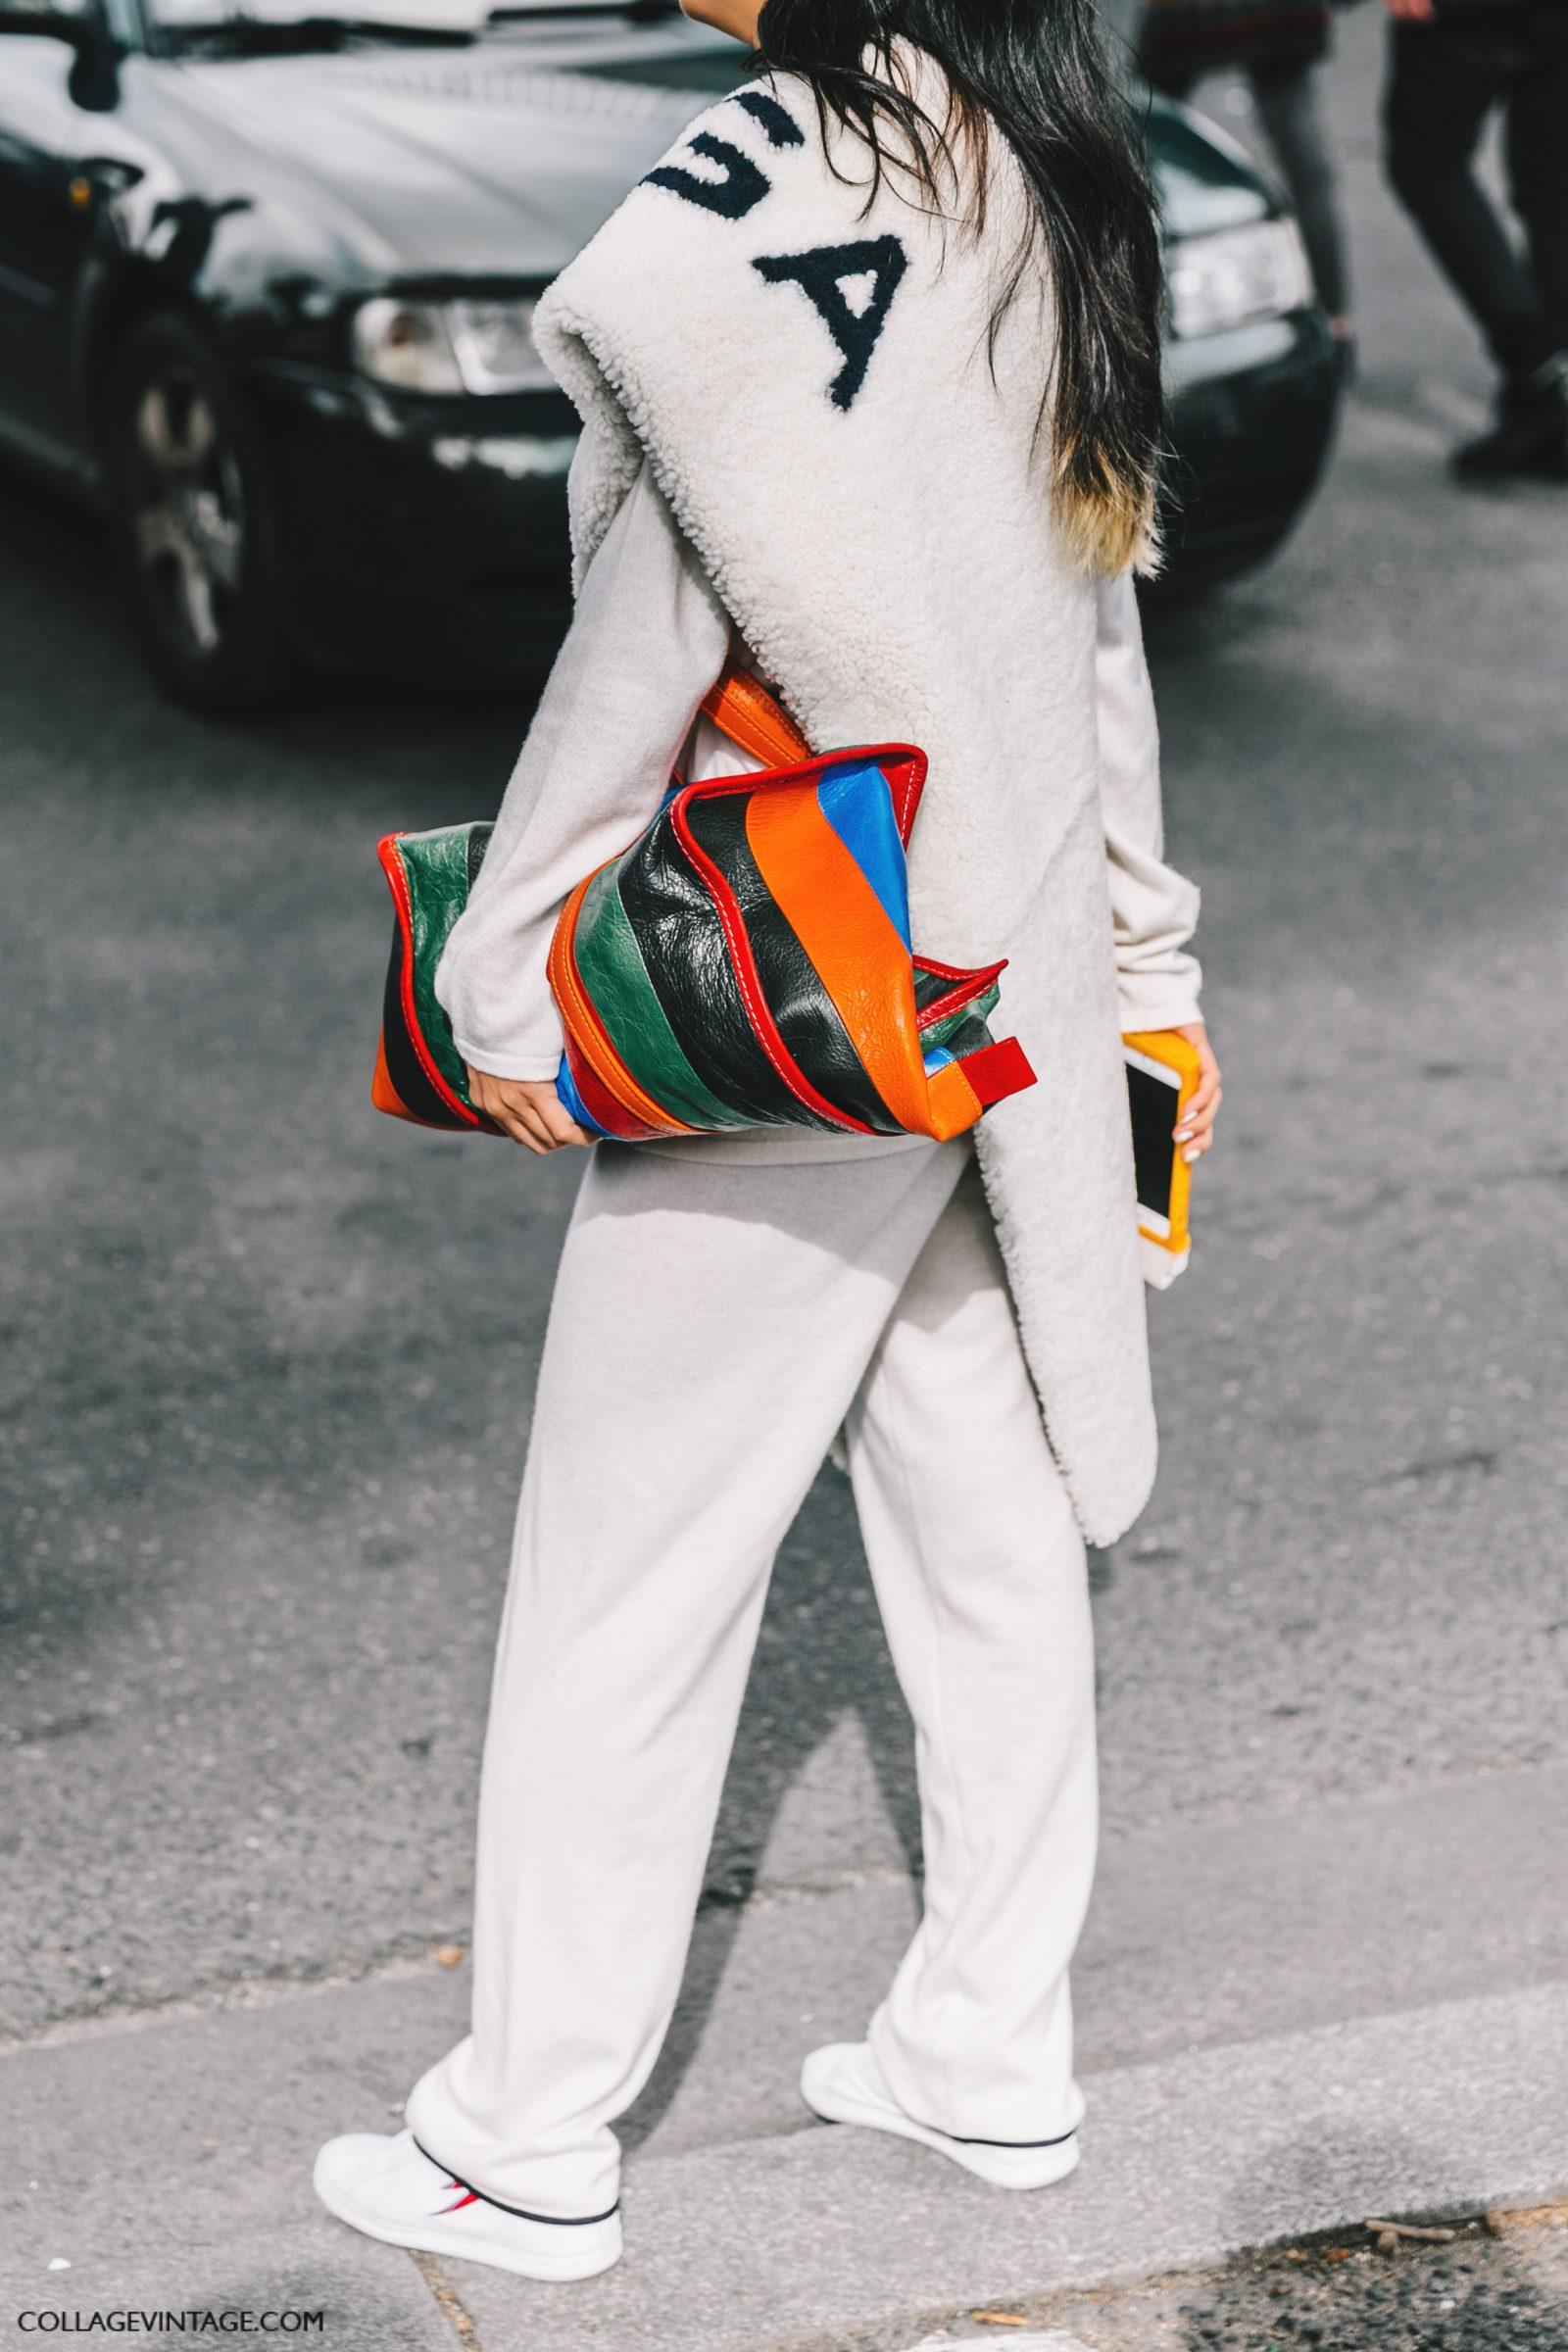 pfw-paris_fashion_week_ss17-street_style-outfits-collage_vintage-valentino-balenciaga-celine-24